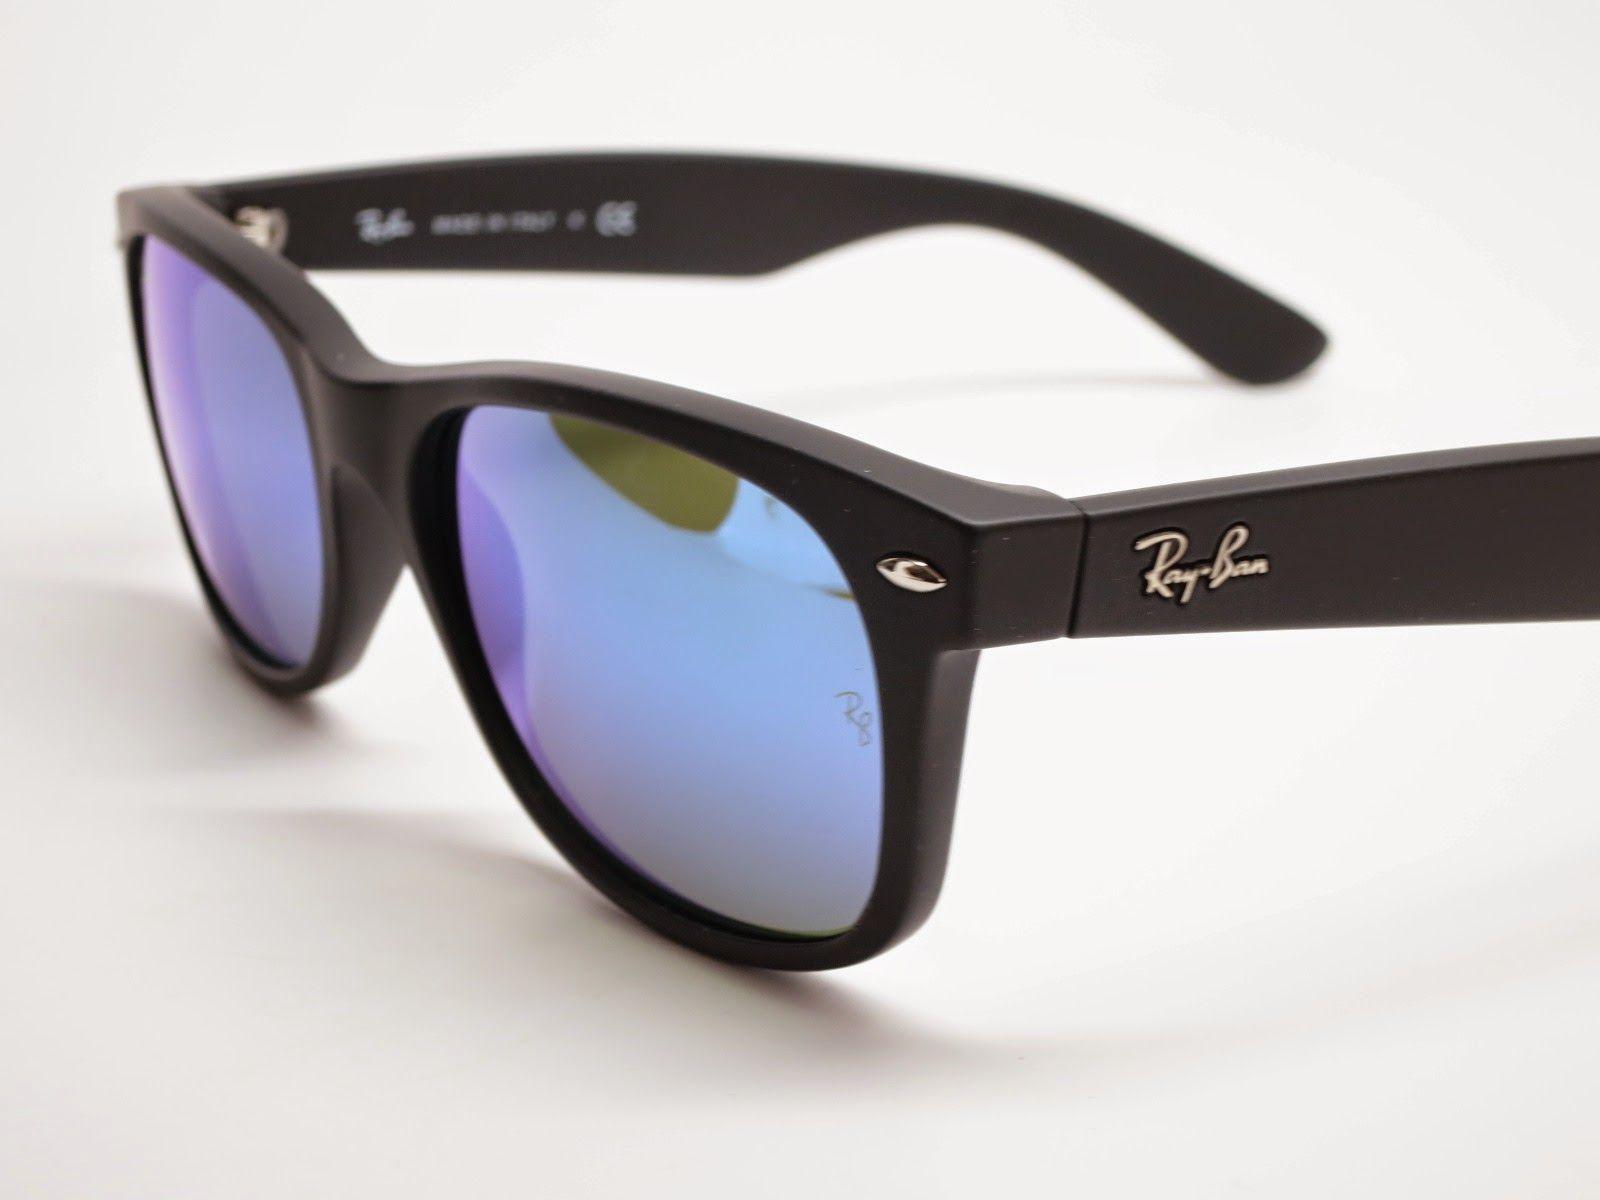 371bf9a3bc Ray-Ban RB 2132 New Wayfarer 622 17 Blue Mirrored Sunglasses